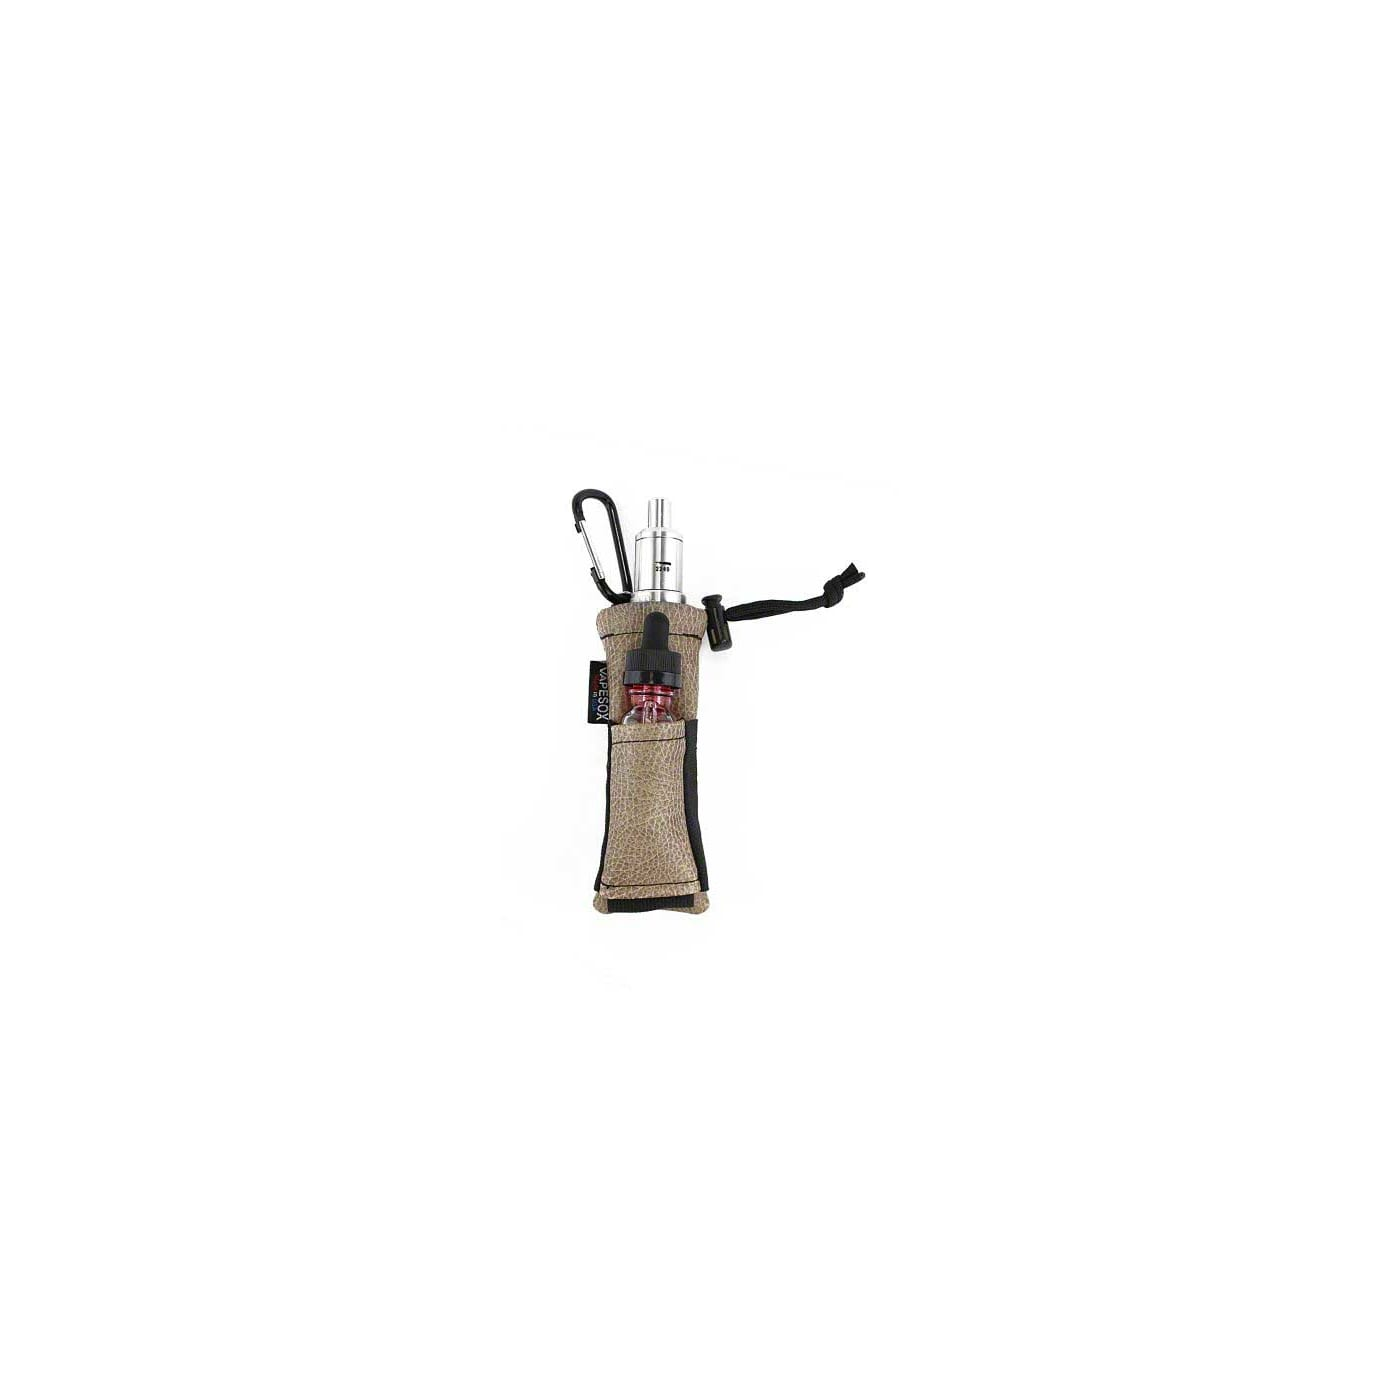 Vapesox VS5 Mod Holder - Cocoa Faux Leather Items